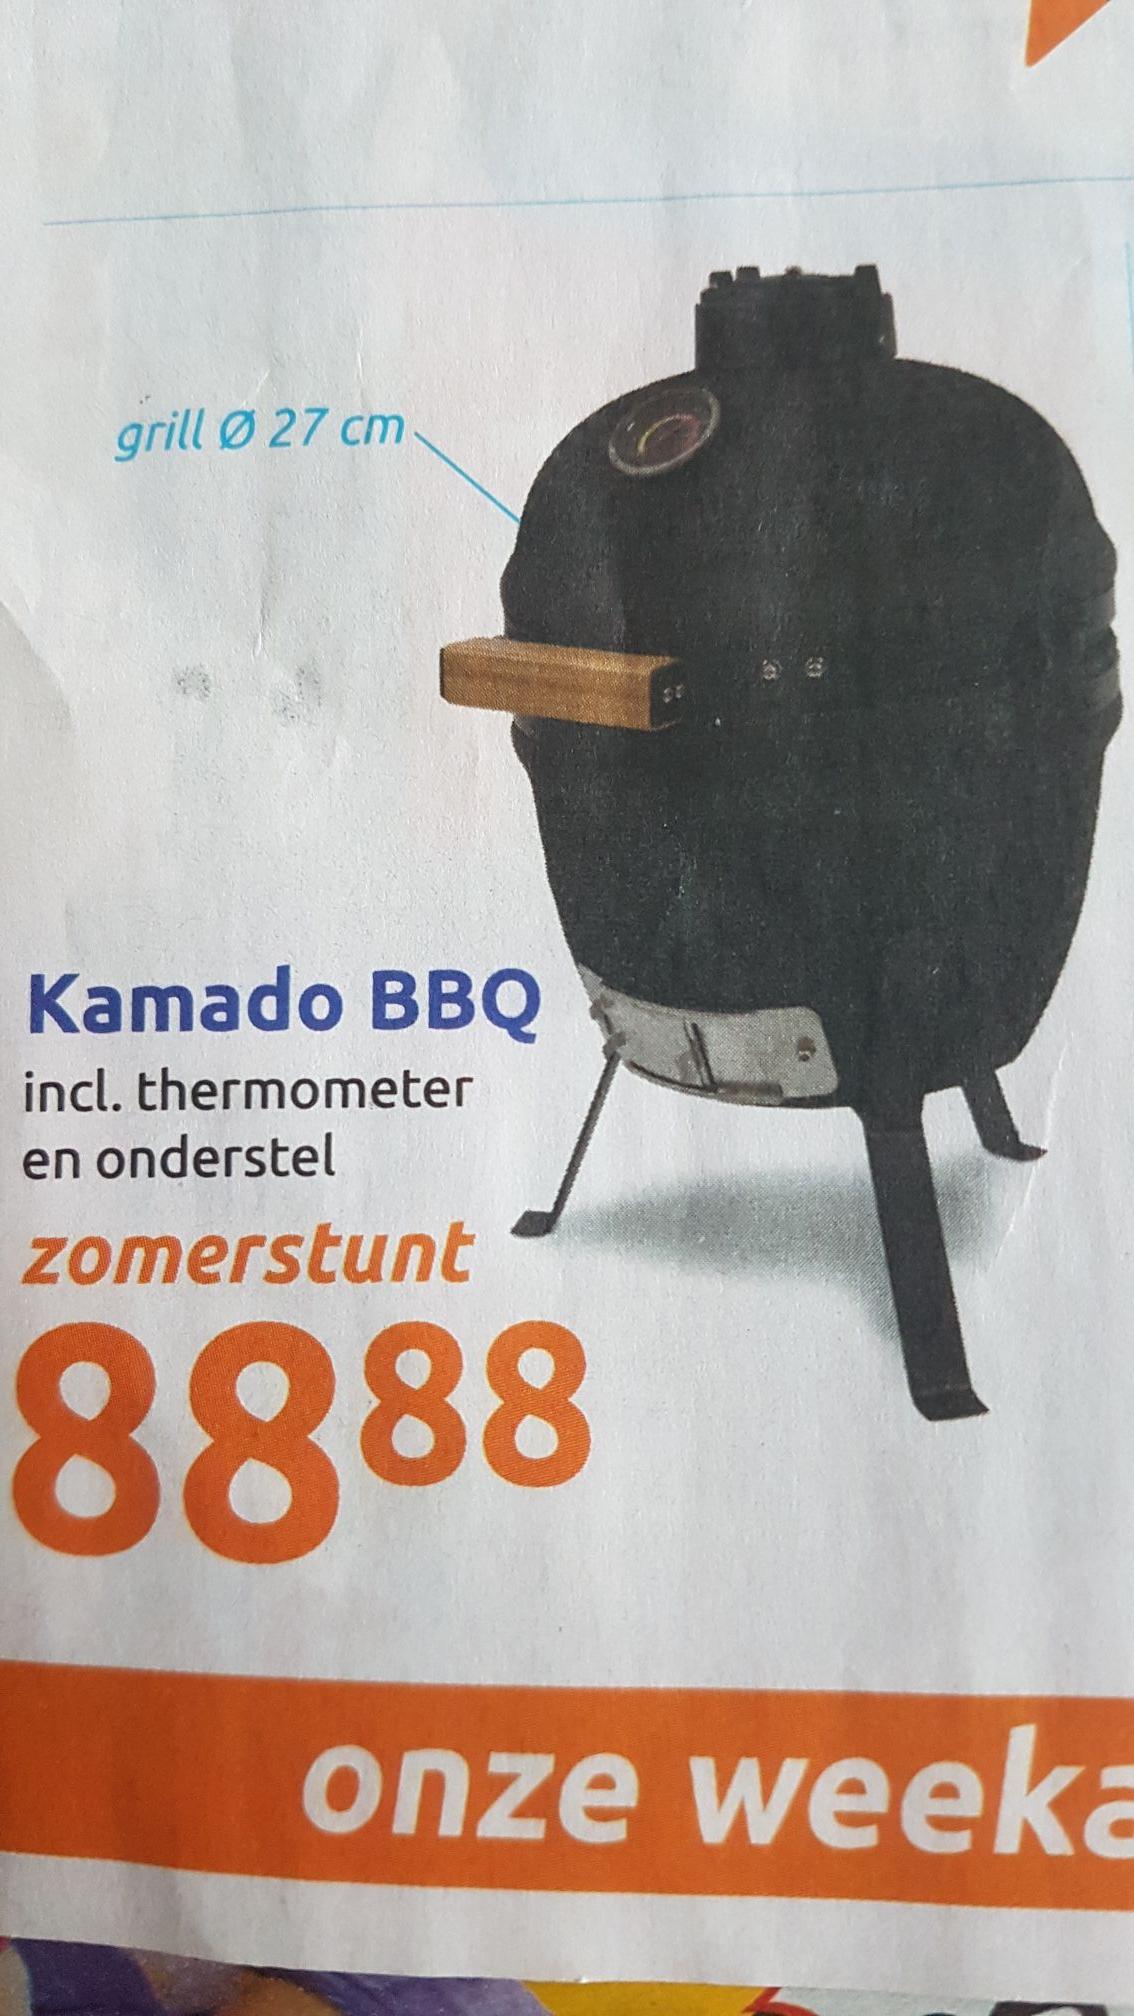 Kamado BBQ Action €88,88 vanaf 3-4